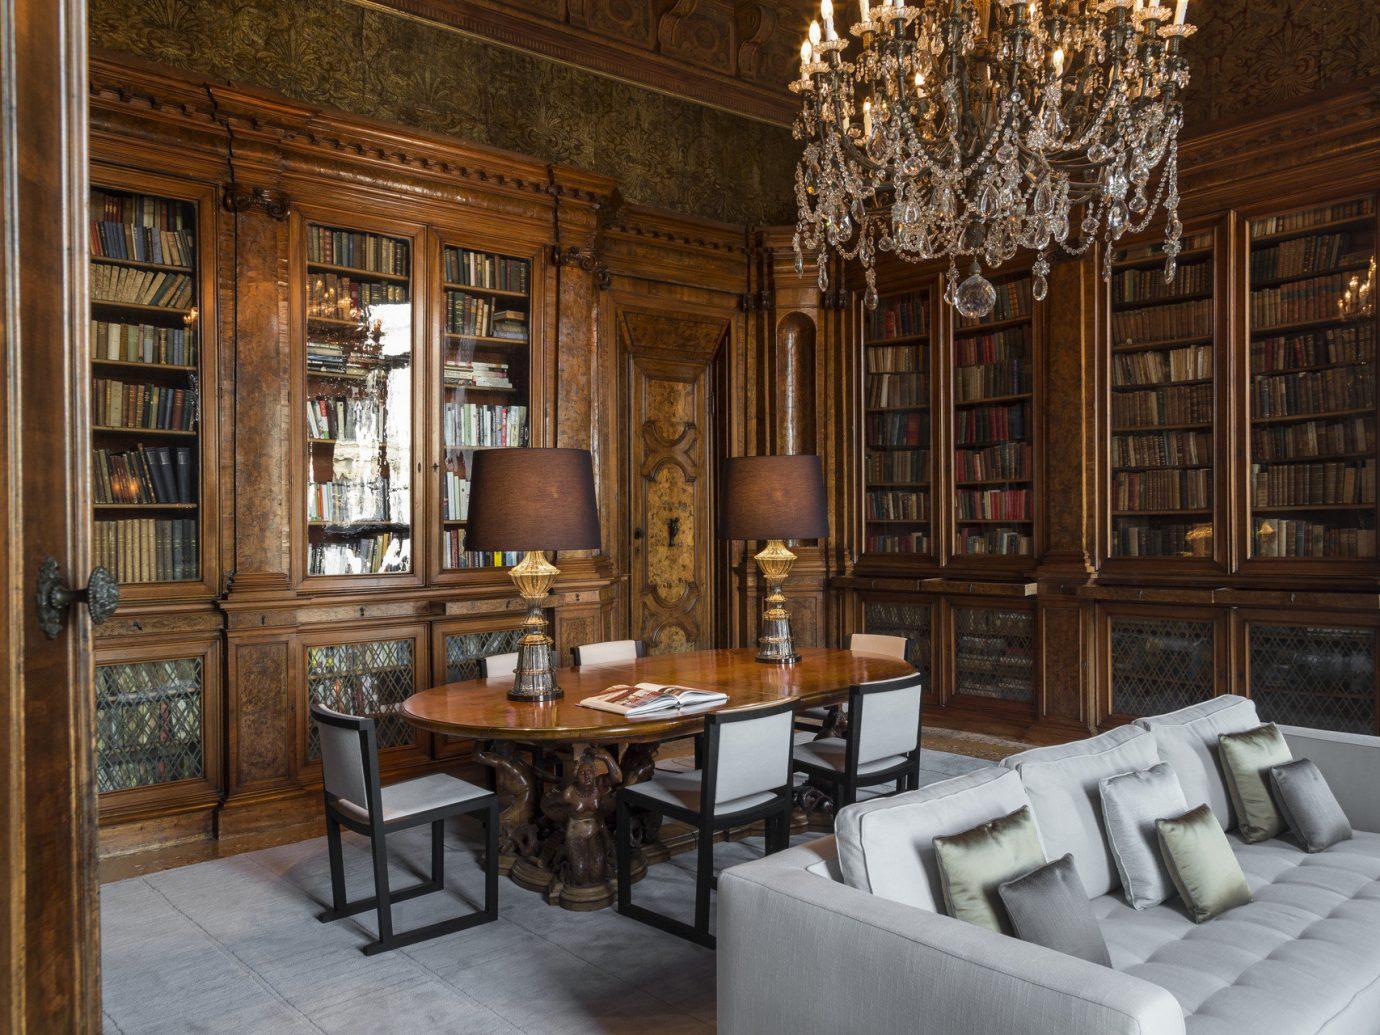 Hotels floor indoor room chair property Living dining room living room library estate home interior design furniture lighting wood Design cabinetry mansion